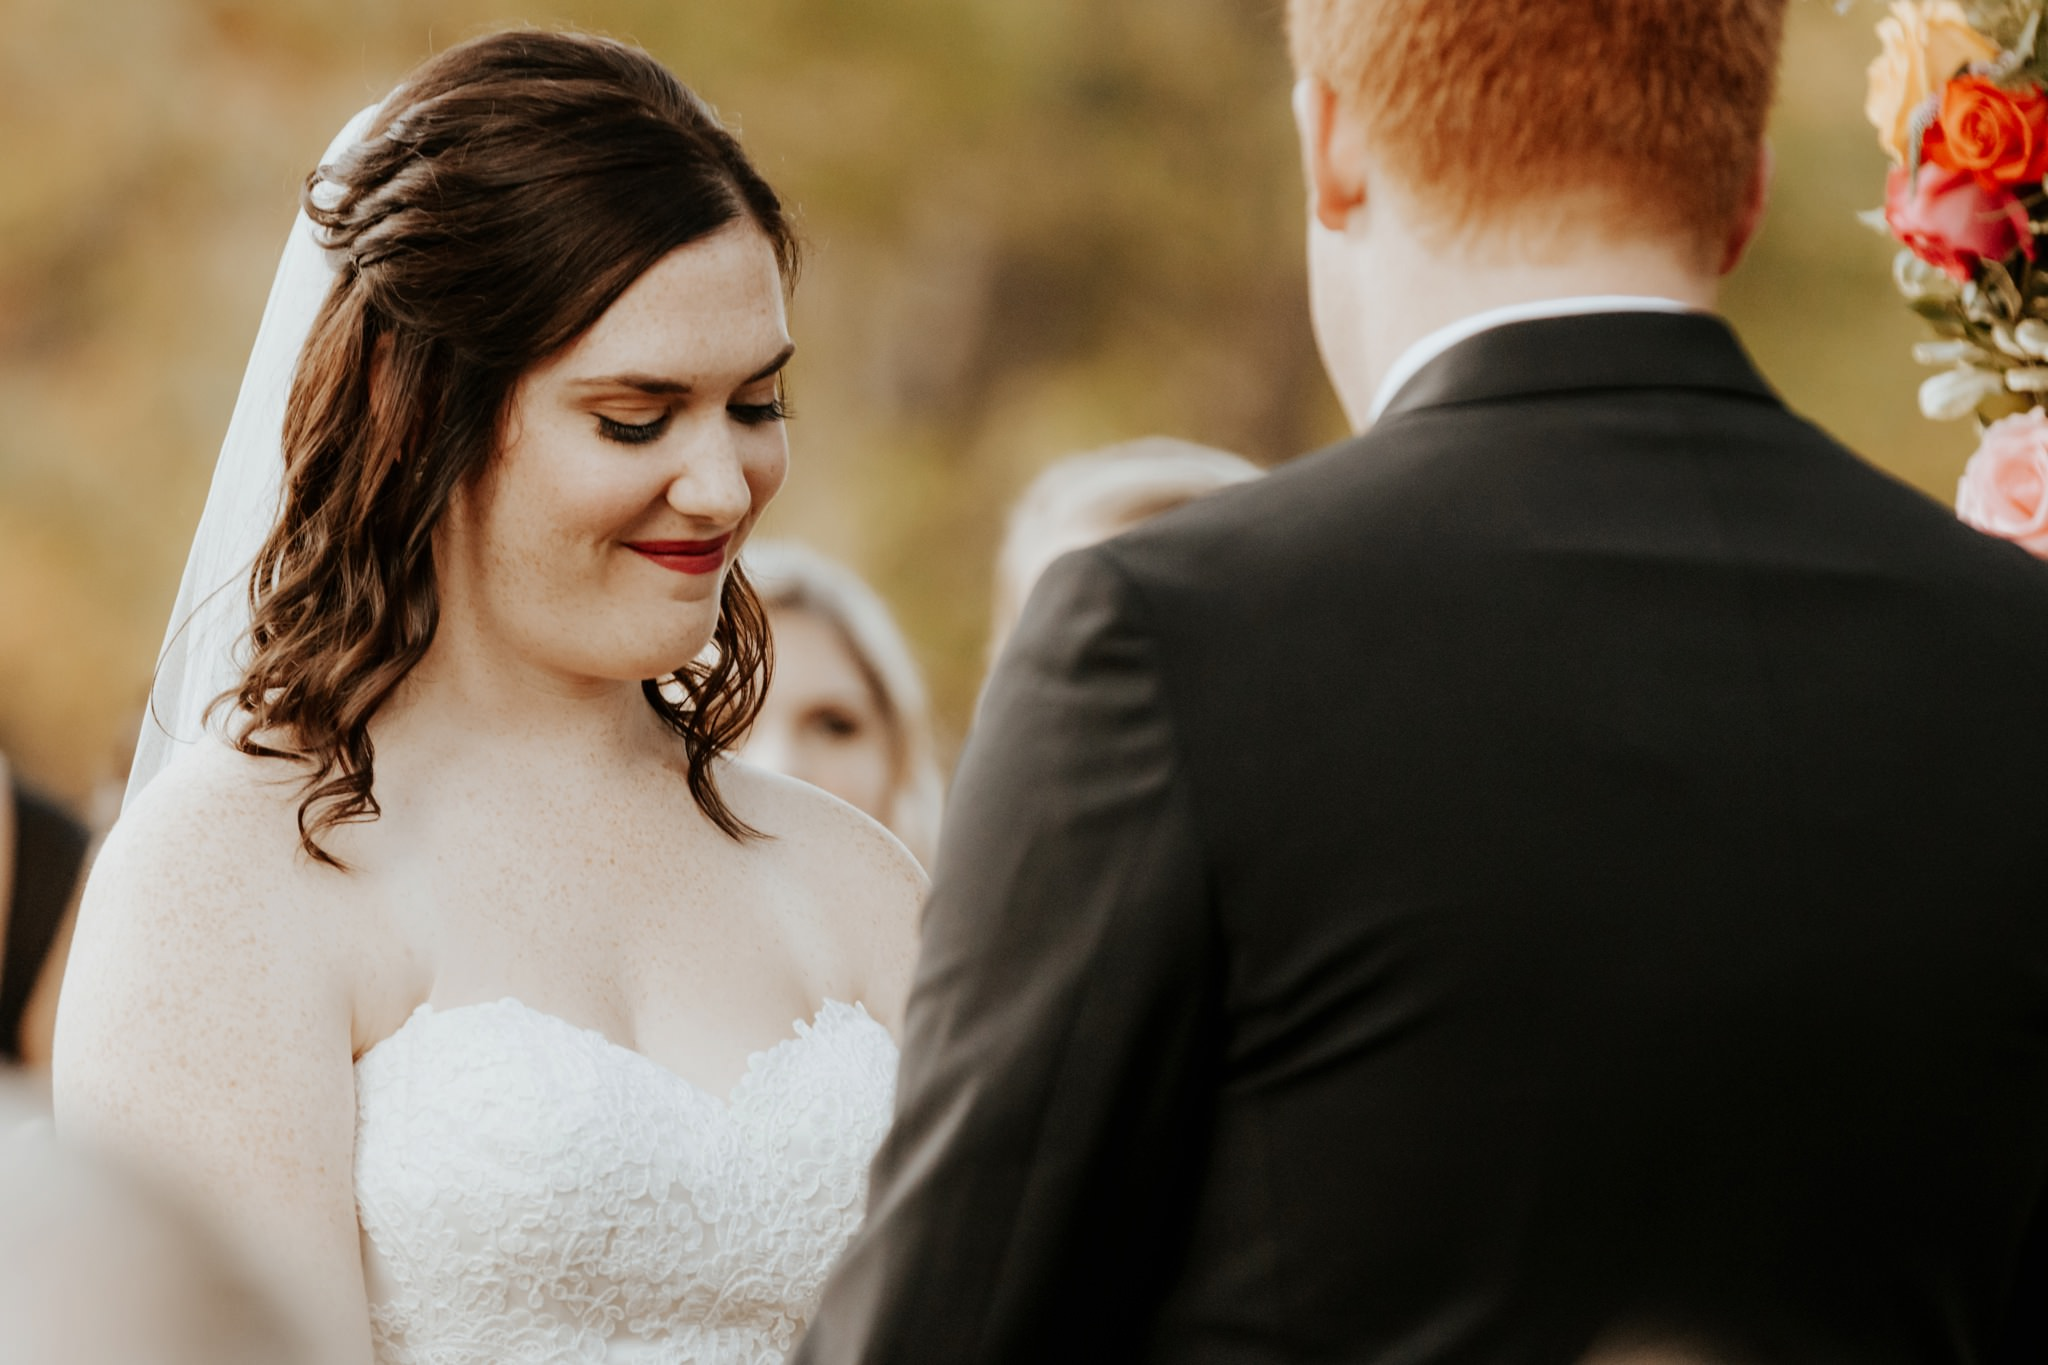 17-09-15 Lindsey and Brandon Wedding Edited-677_WEB.jpg